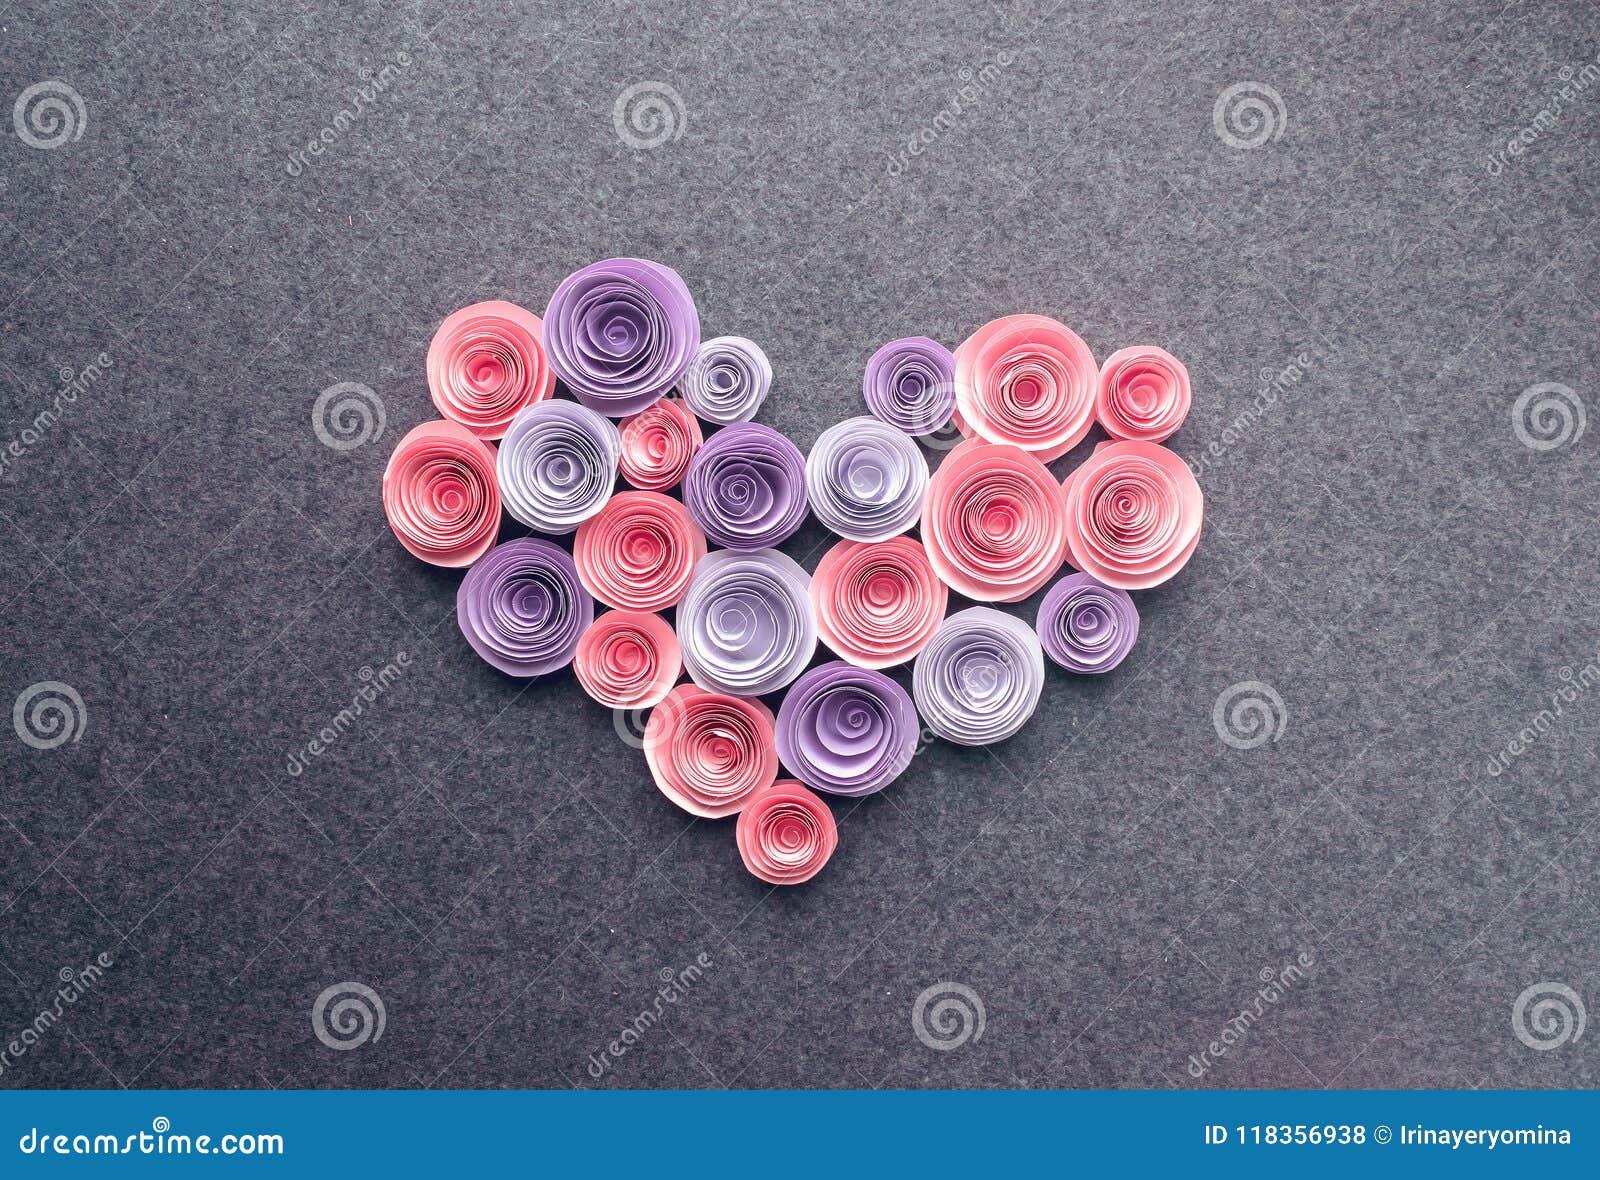 Handmade Paper Flowers Heart On Dark Felt Background Beautiful